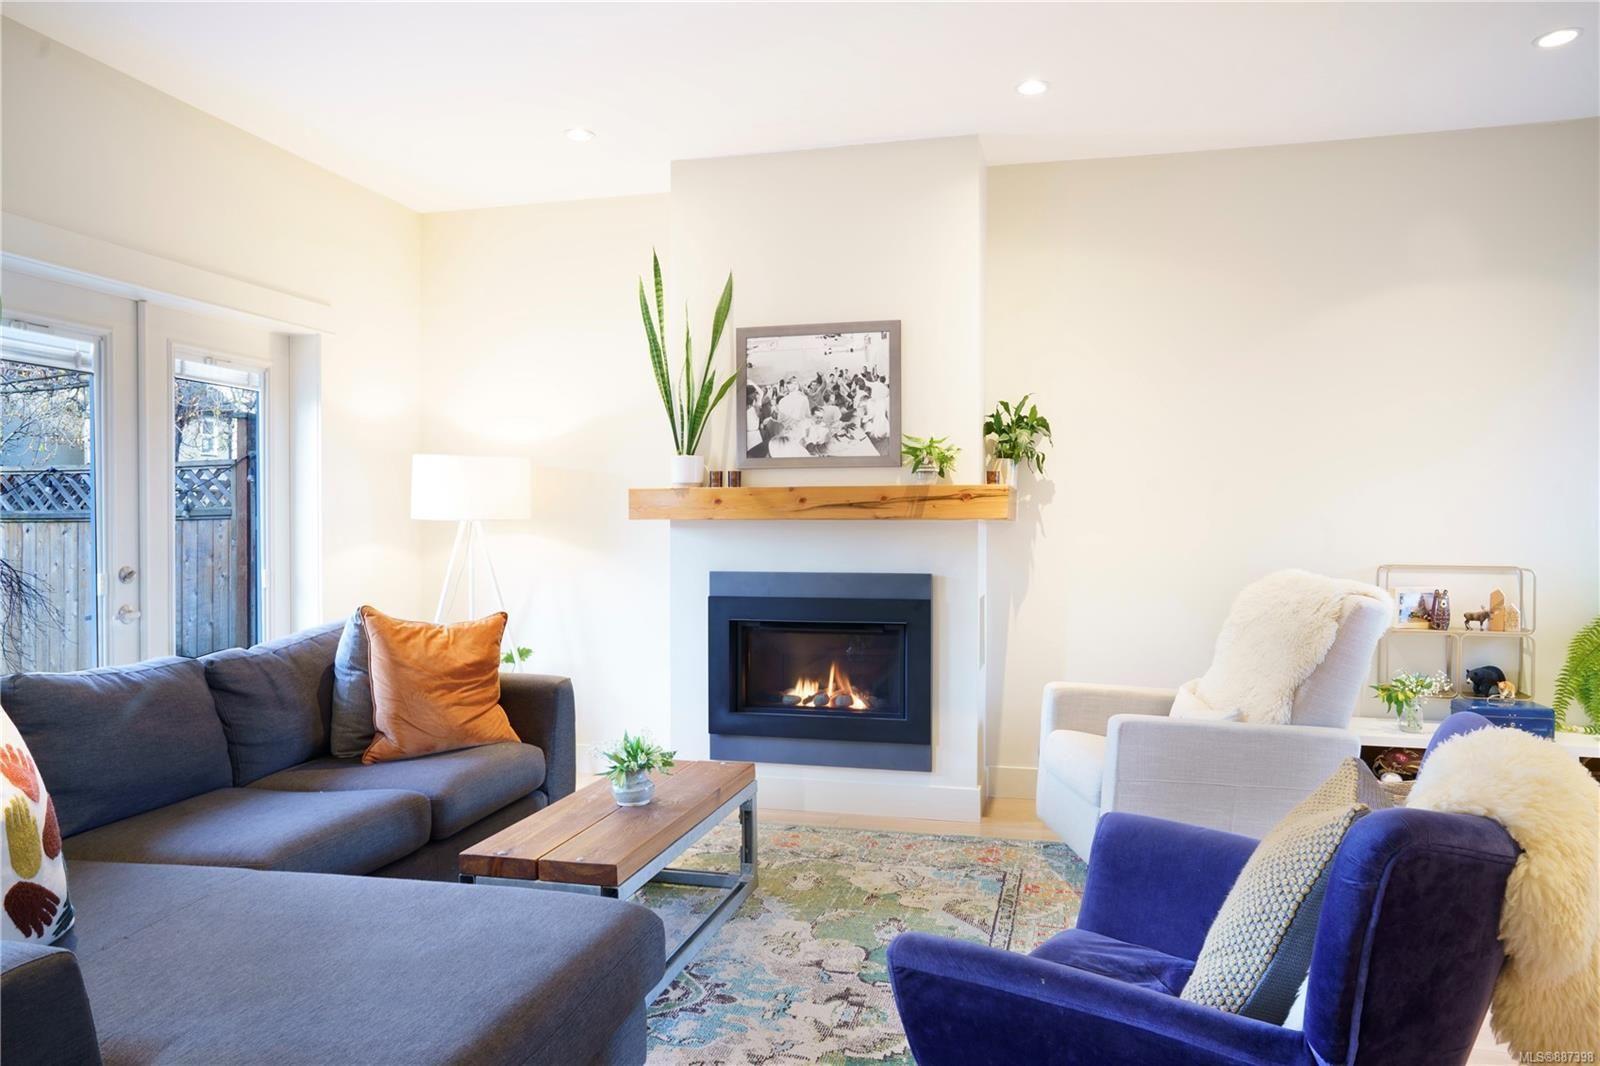 Main Photo: 944 Mason St in Victoria: Vi Central Park House for sale : MLS®# 887398